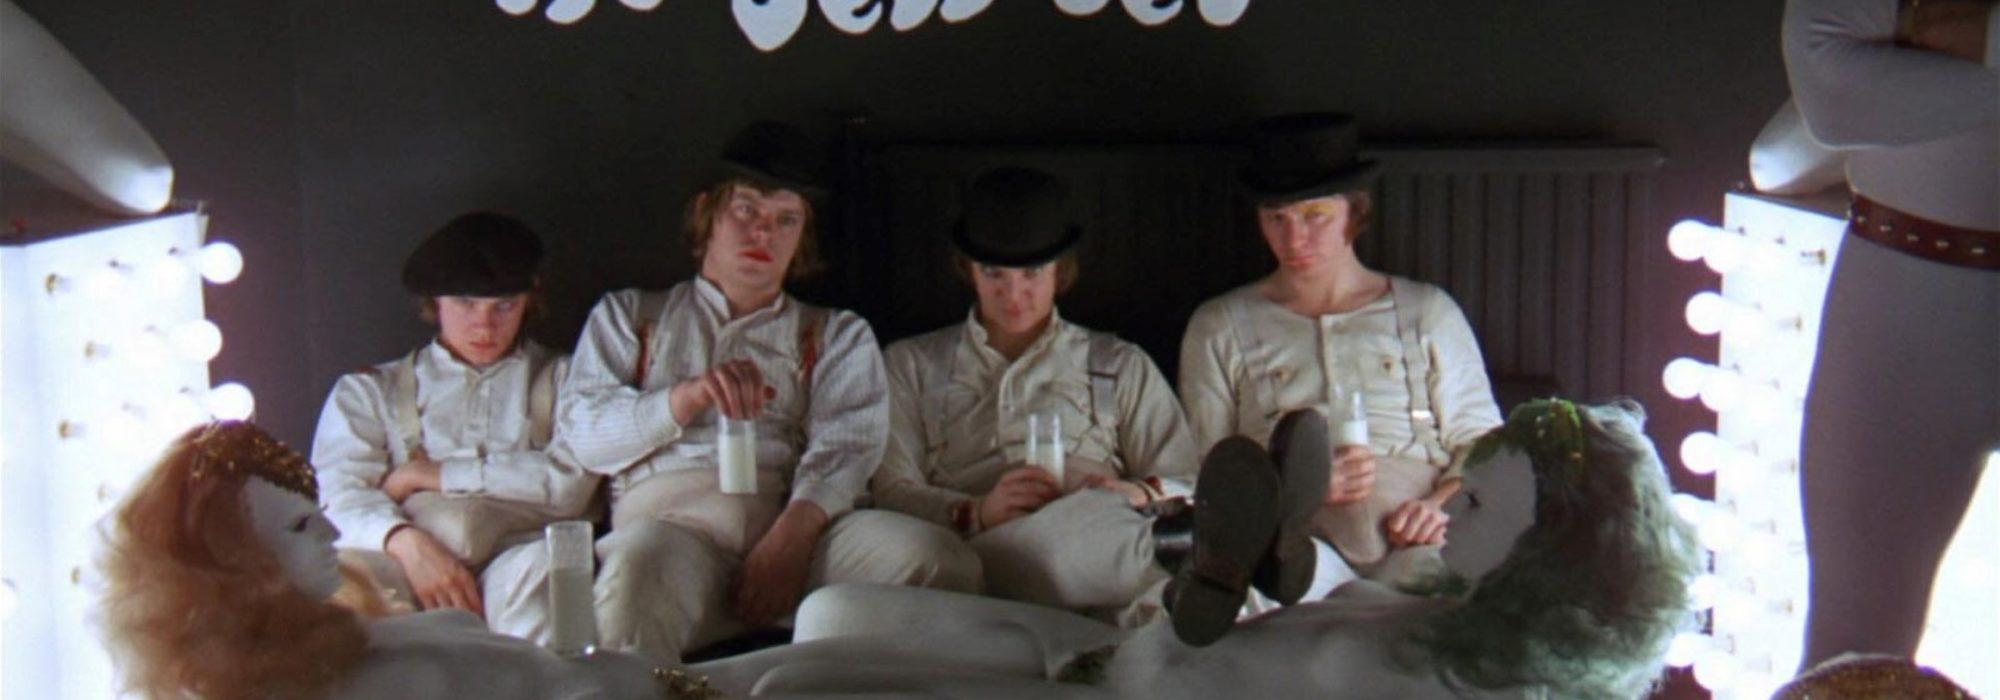 Imagem: cena do filme Laranja Mecânica, de Stanley Kubrick